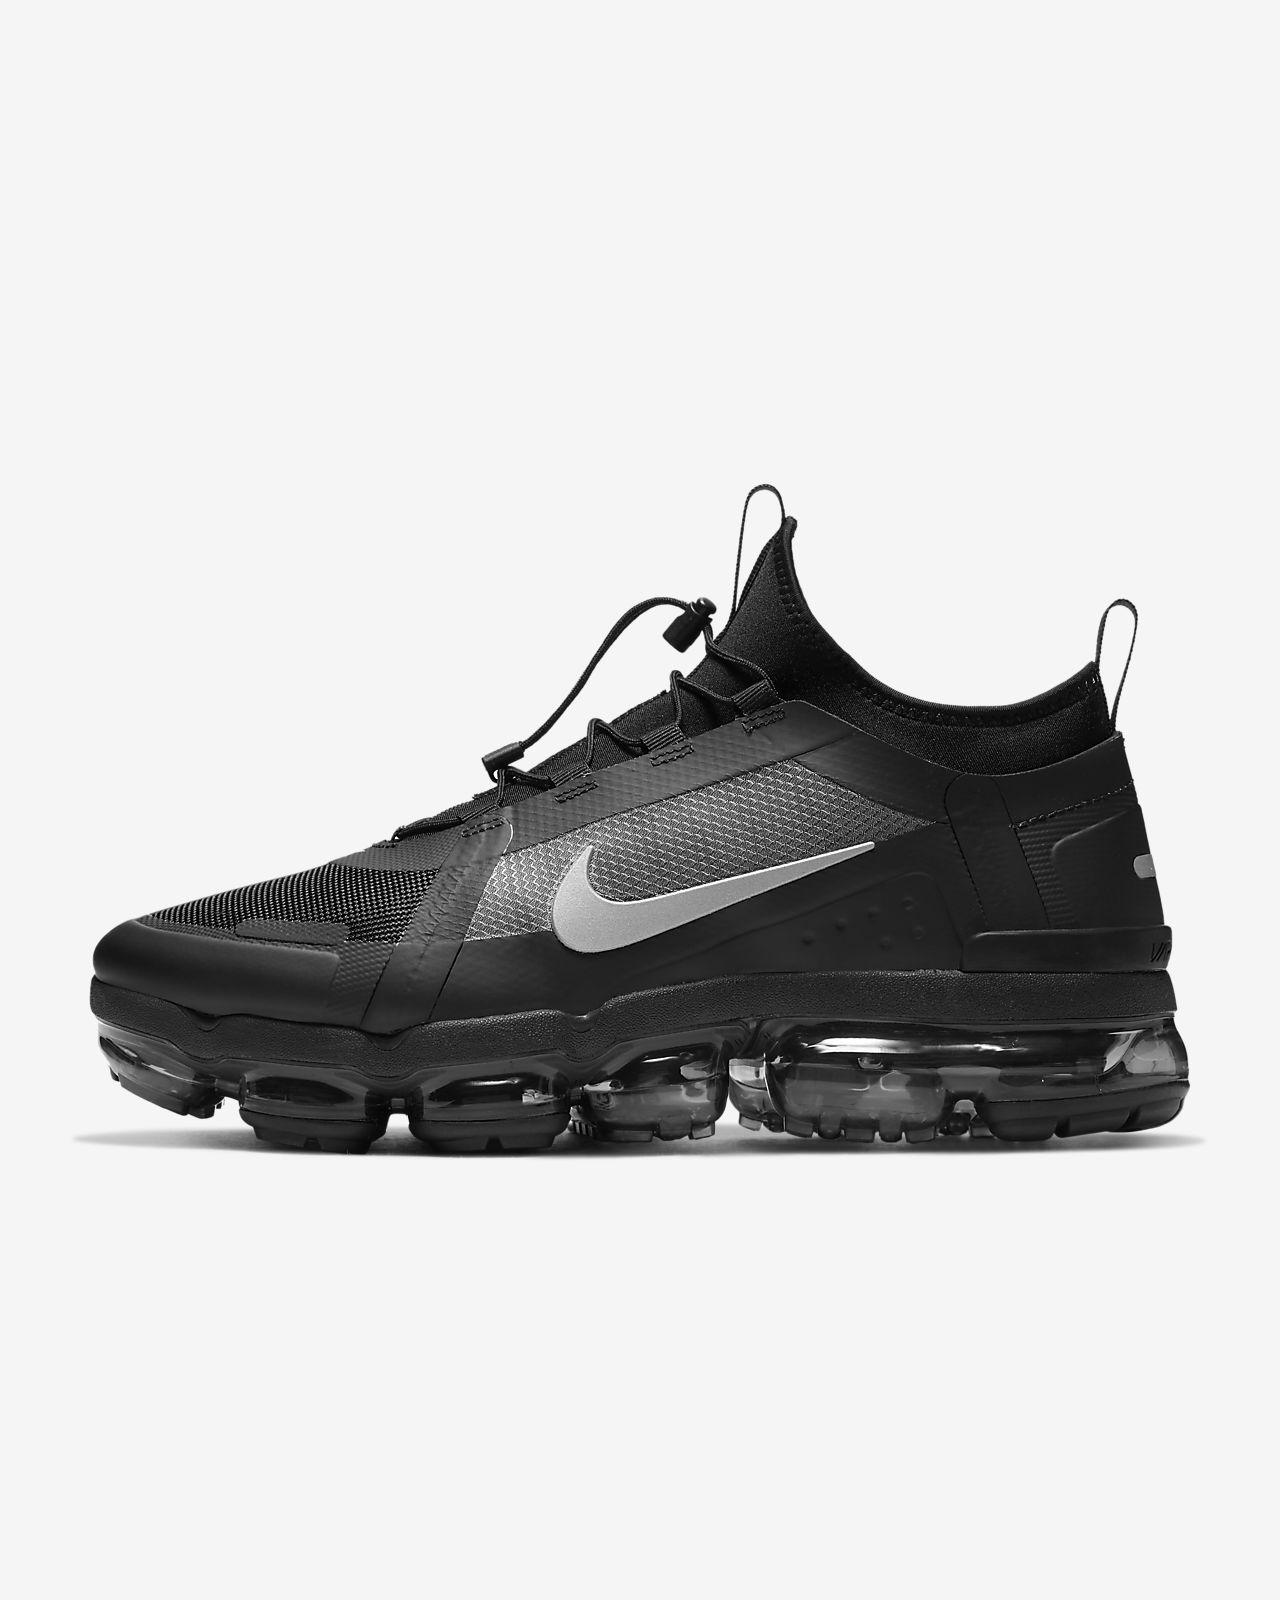 Pánská bota Nike Air VaporMax 2019 Utility